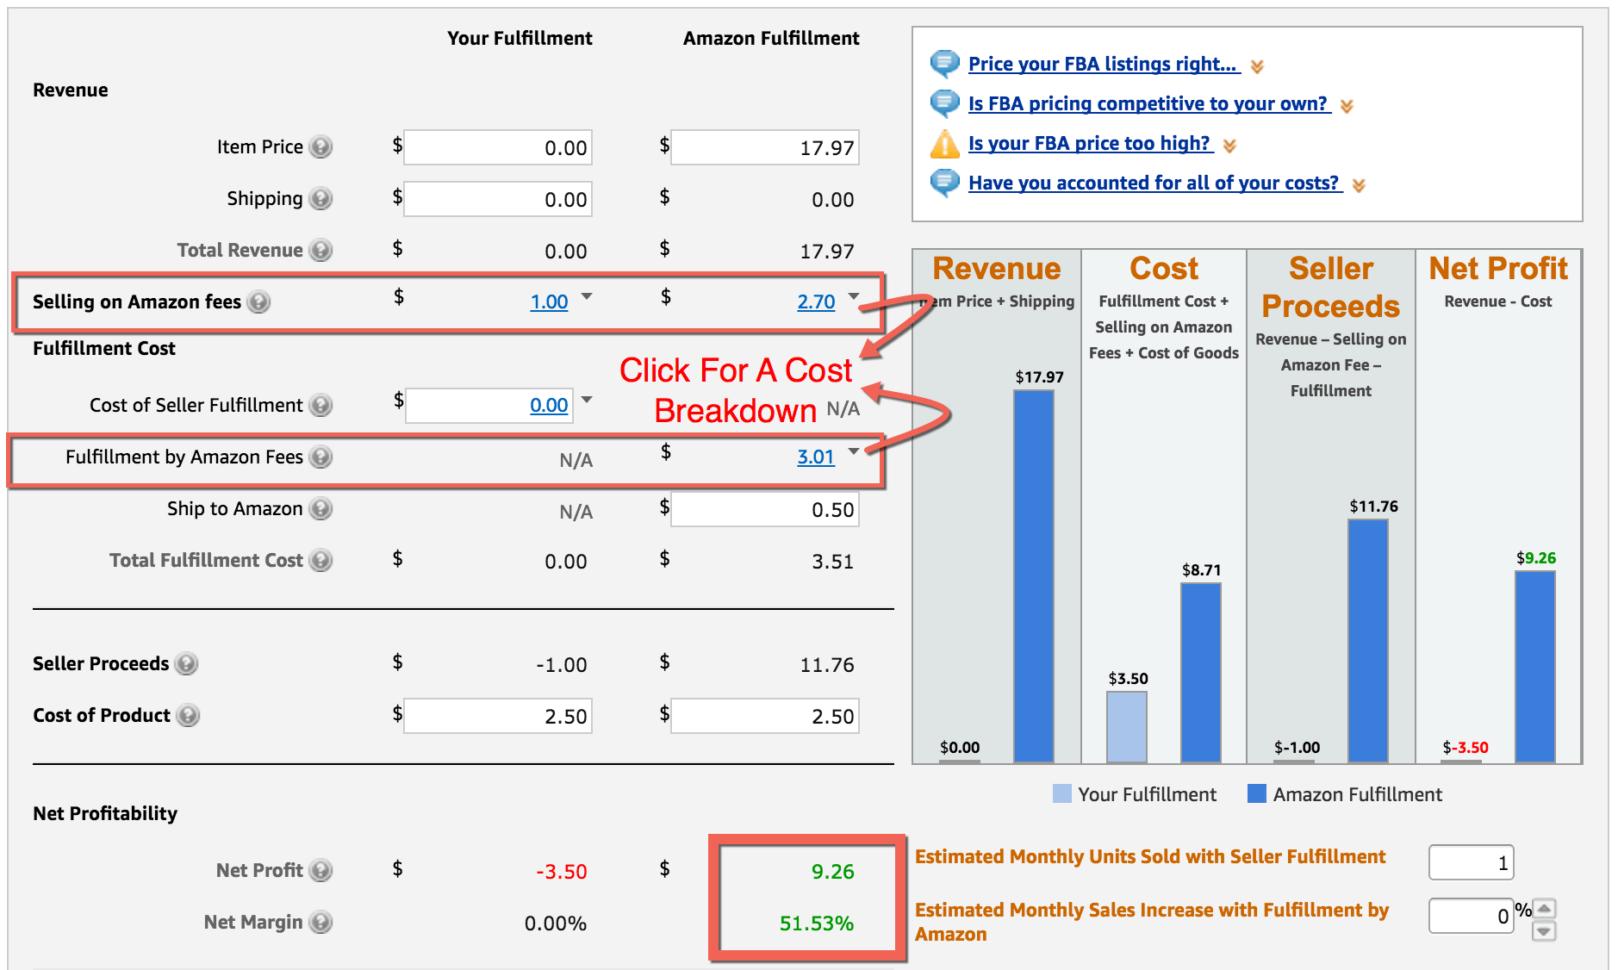 Amazon Fba Profit Spreadsheet Inside Fba Calculator: Free Tool To Calculate Amazon Fees, Profit  Revenue